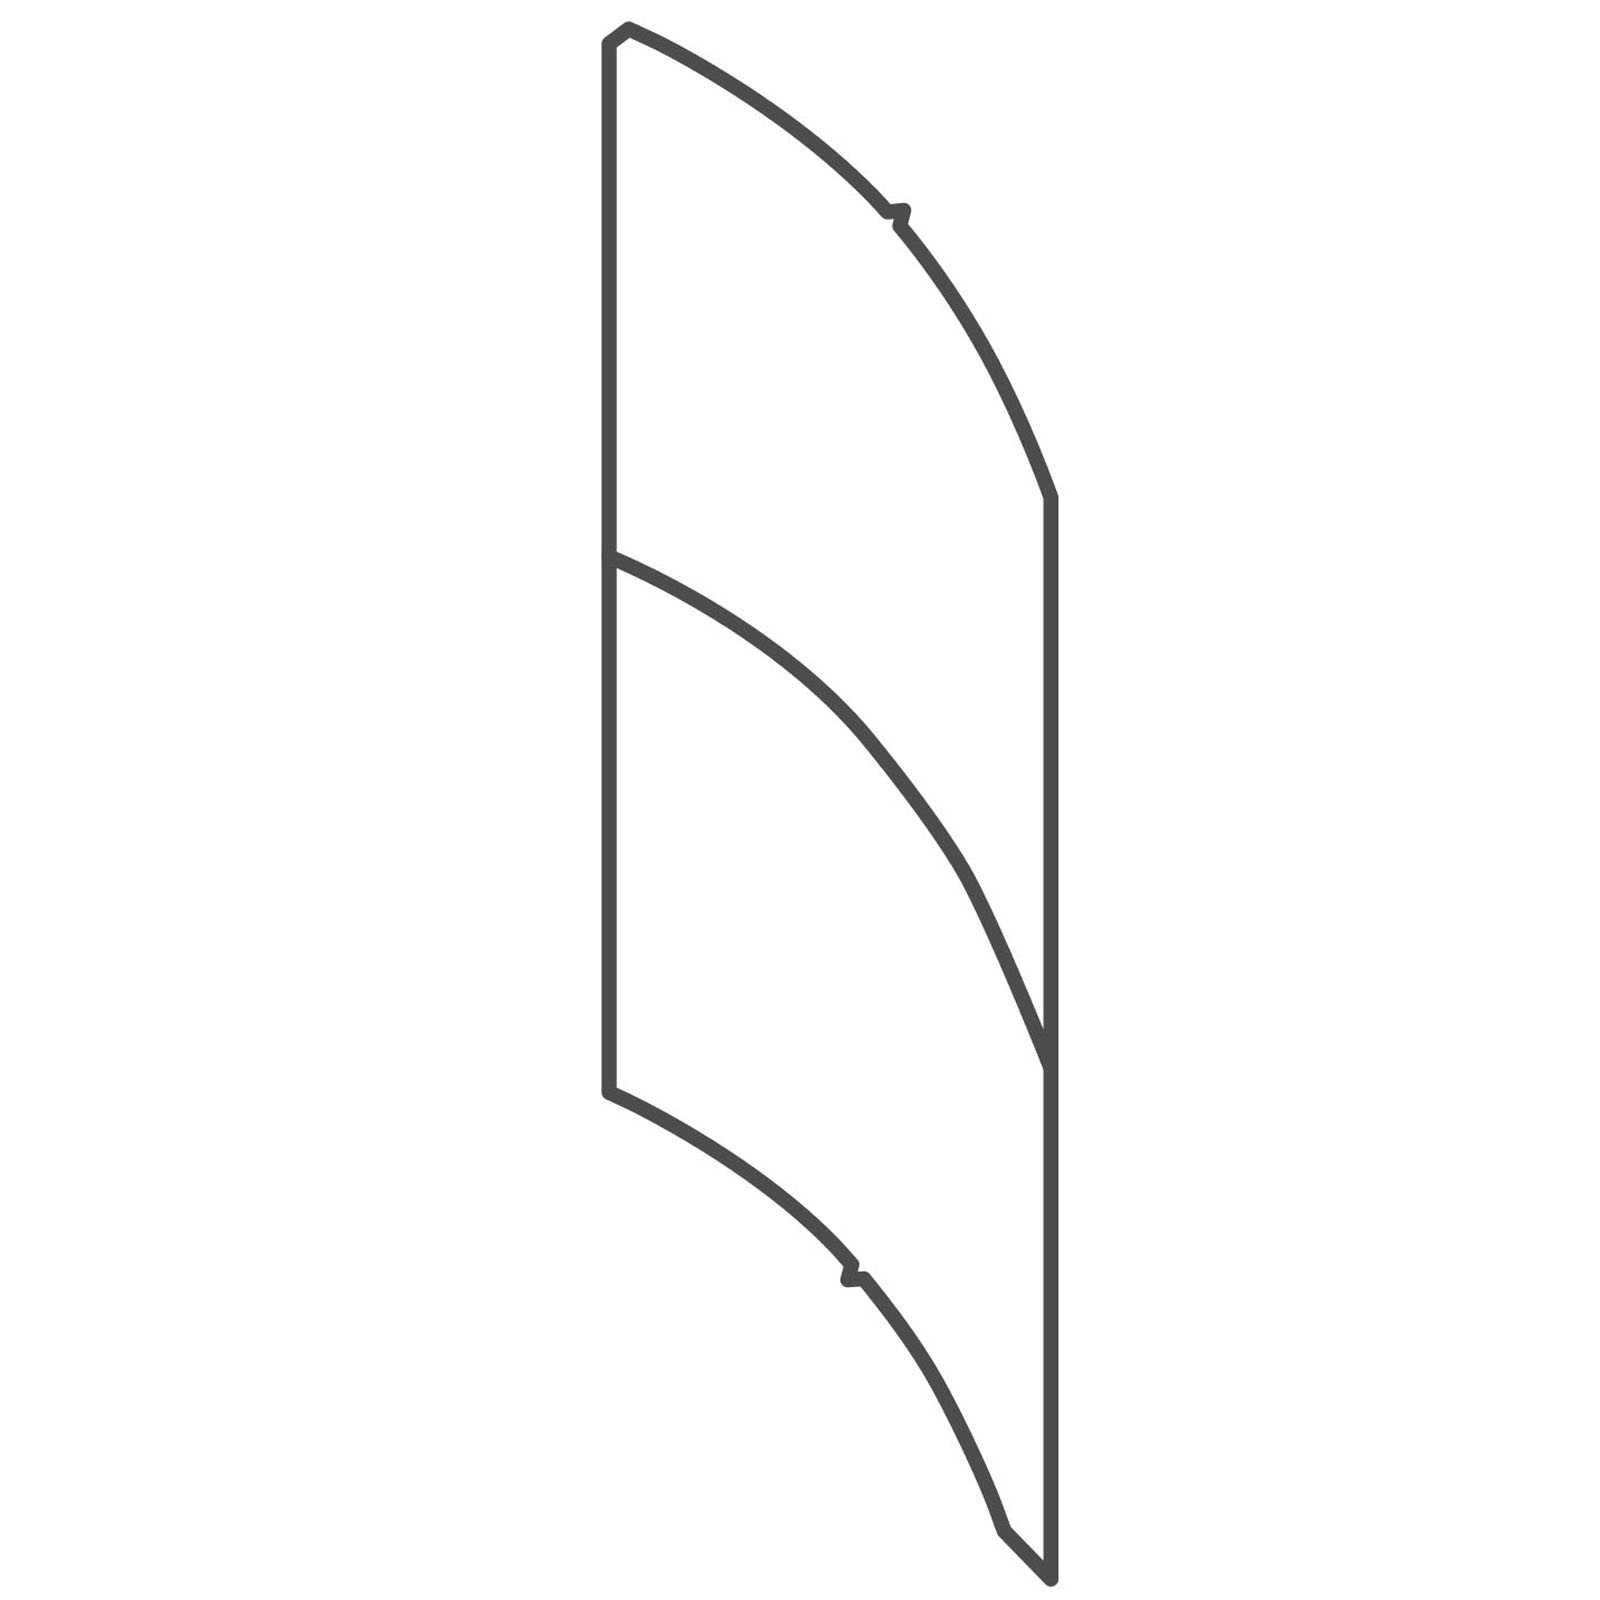 instruction:Diagram B